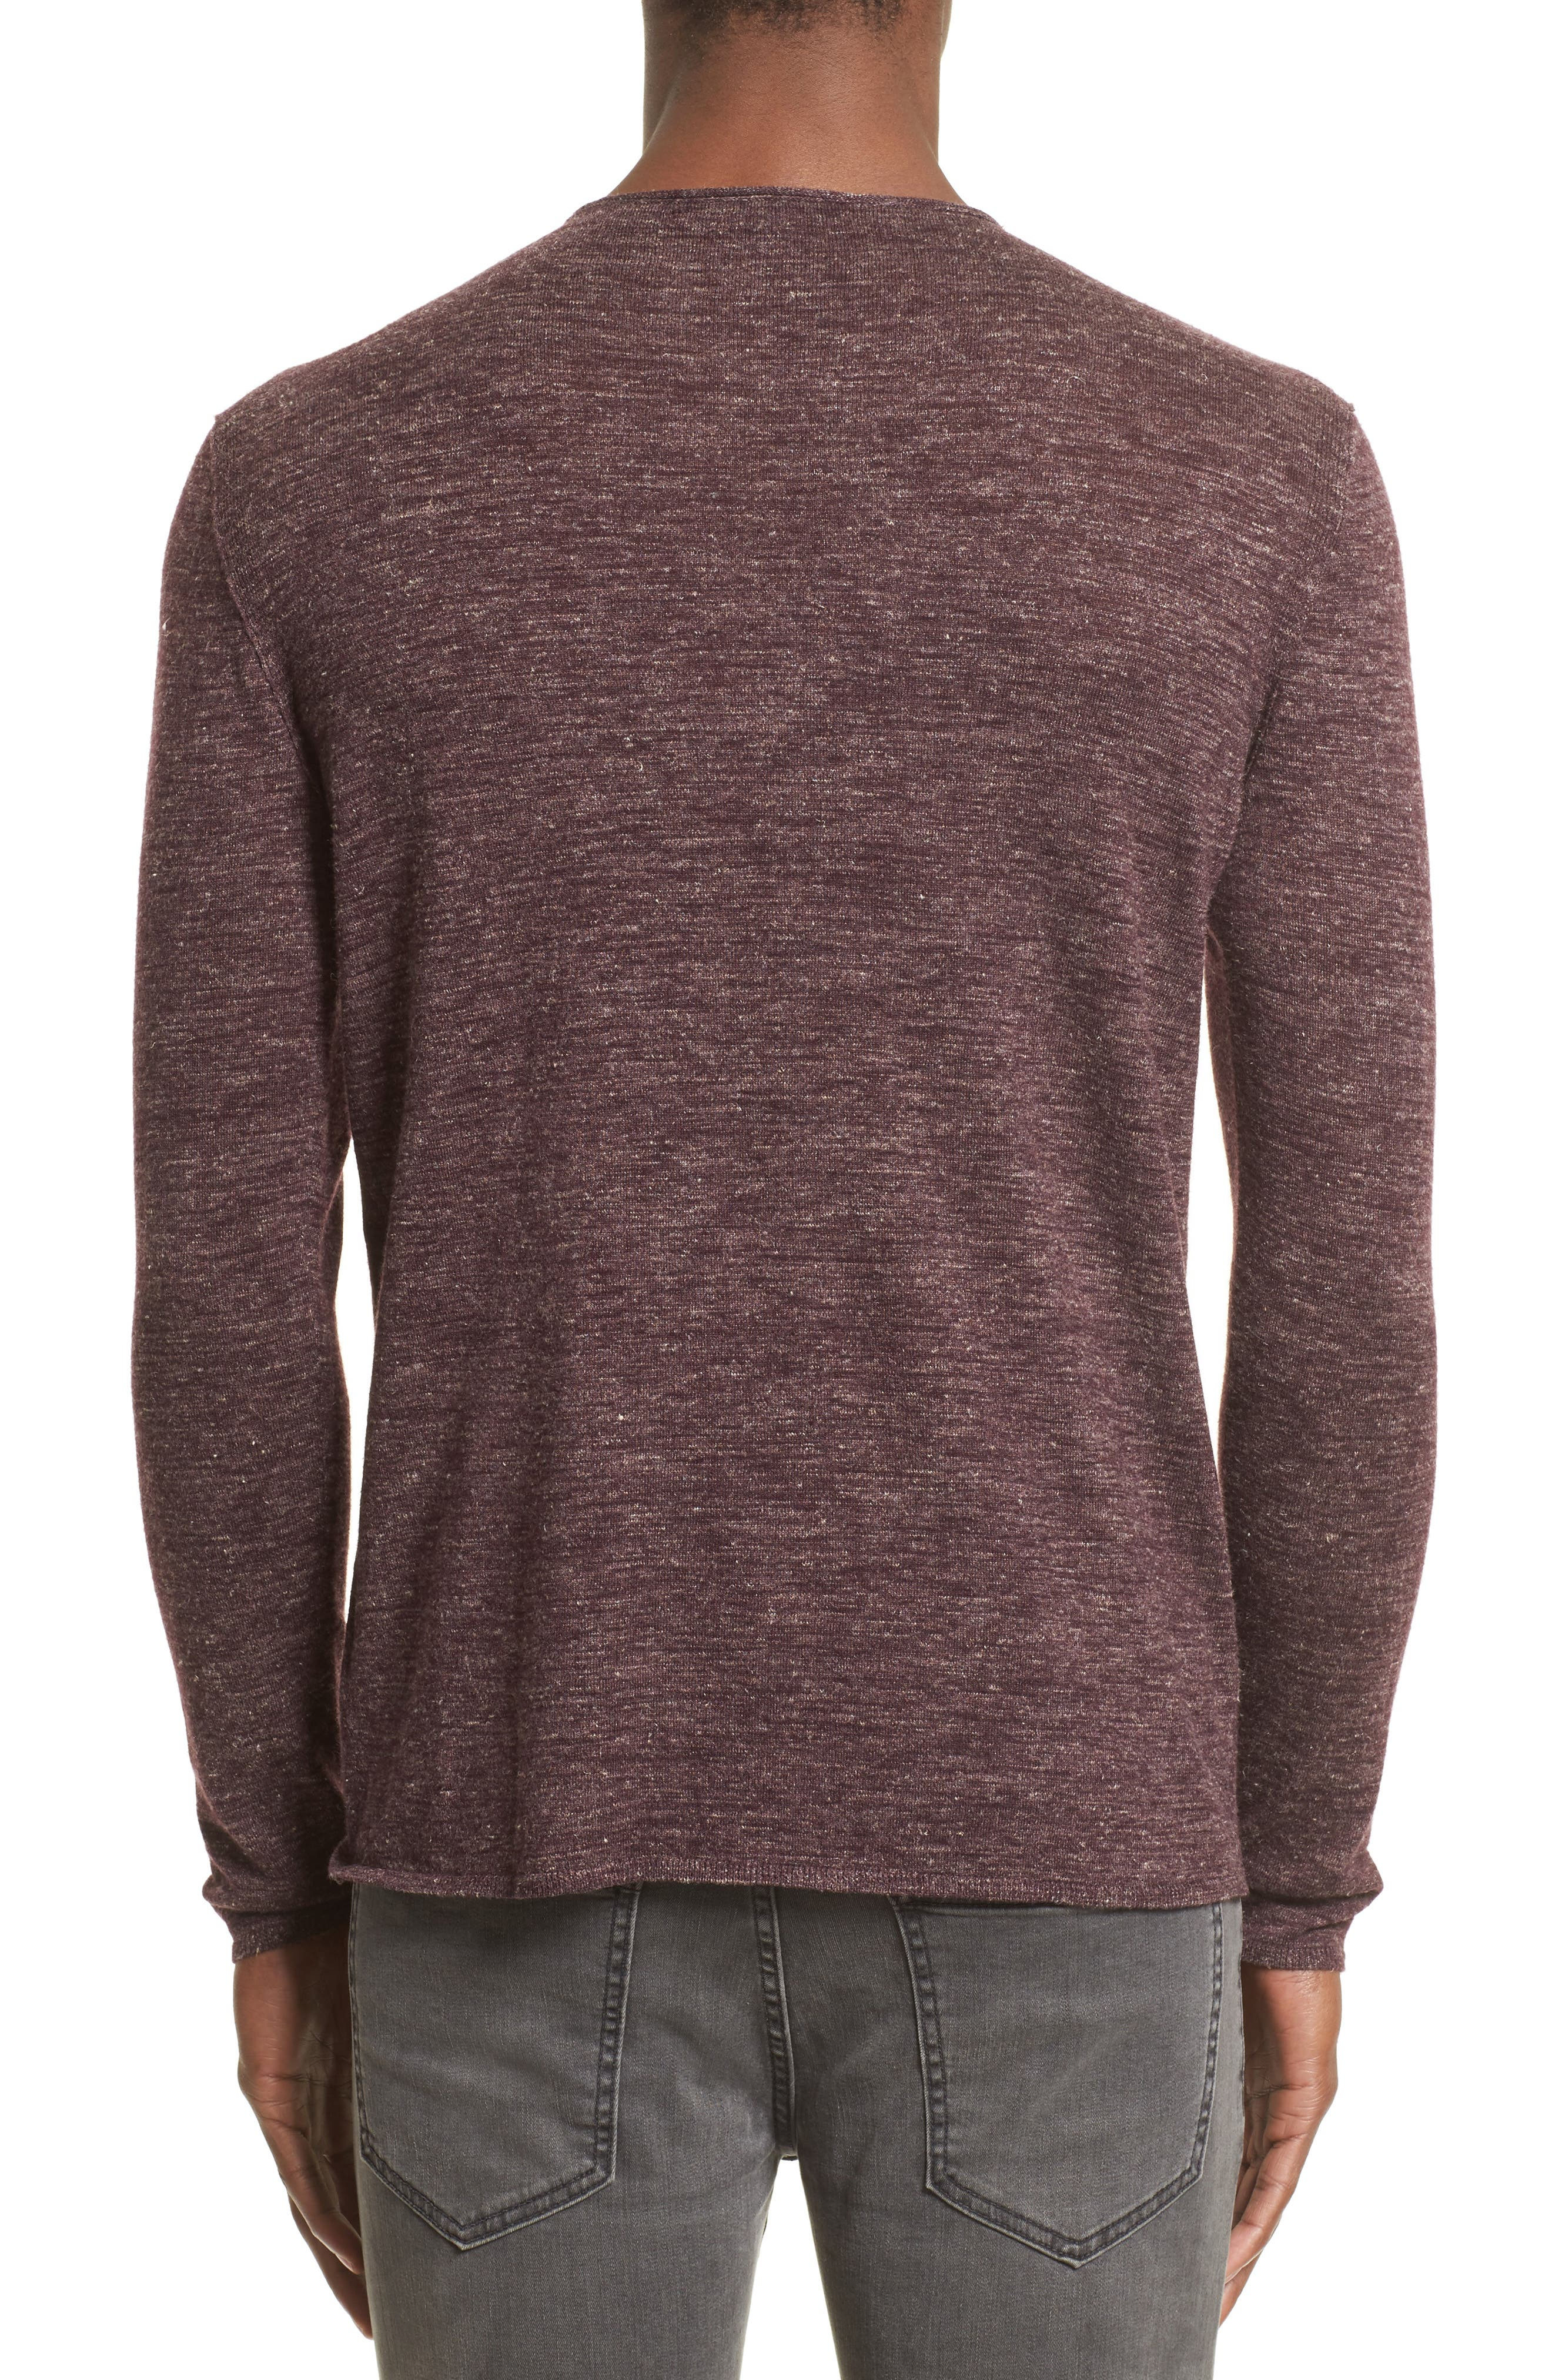 Alternate Image 2  - John Varvatos Collection Heathered Crewneck Sweater